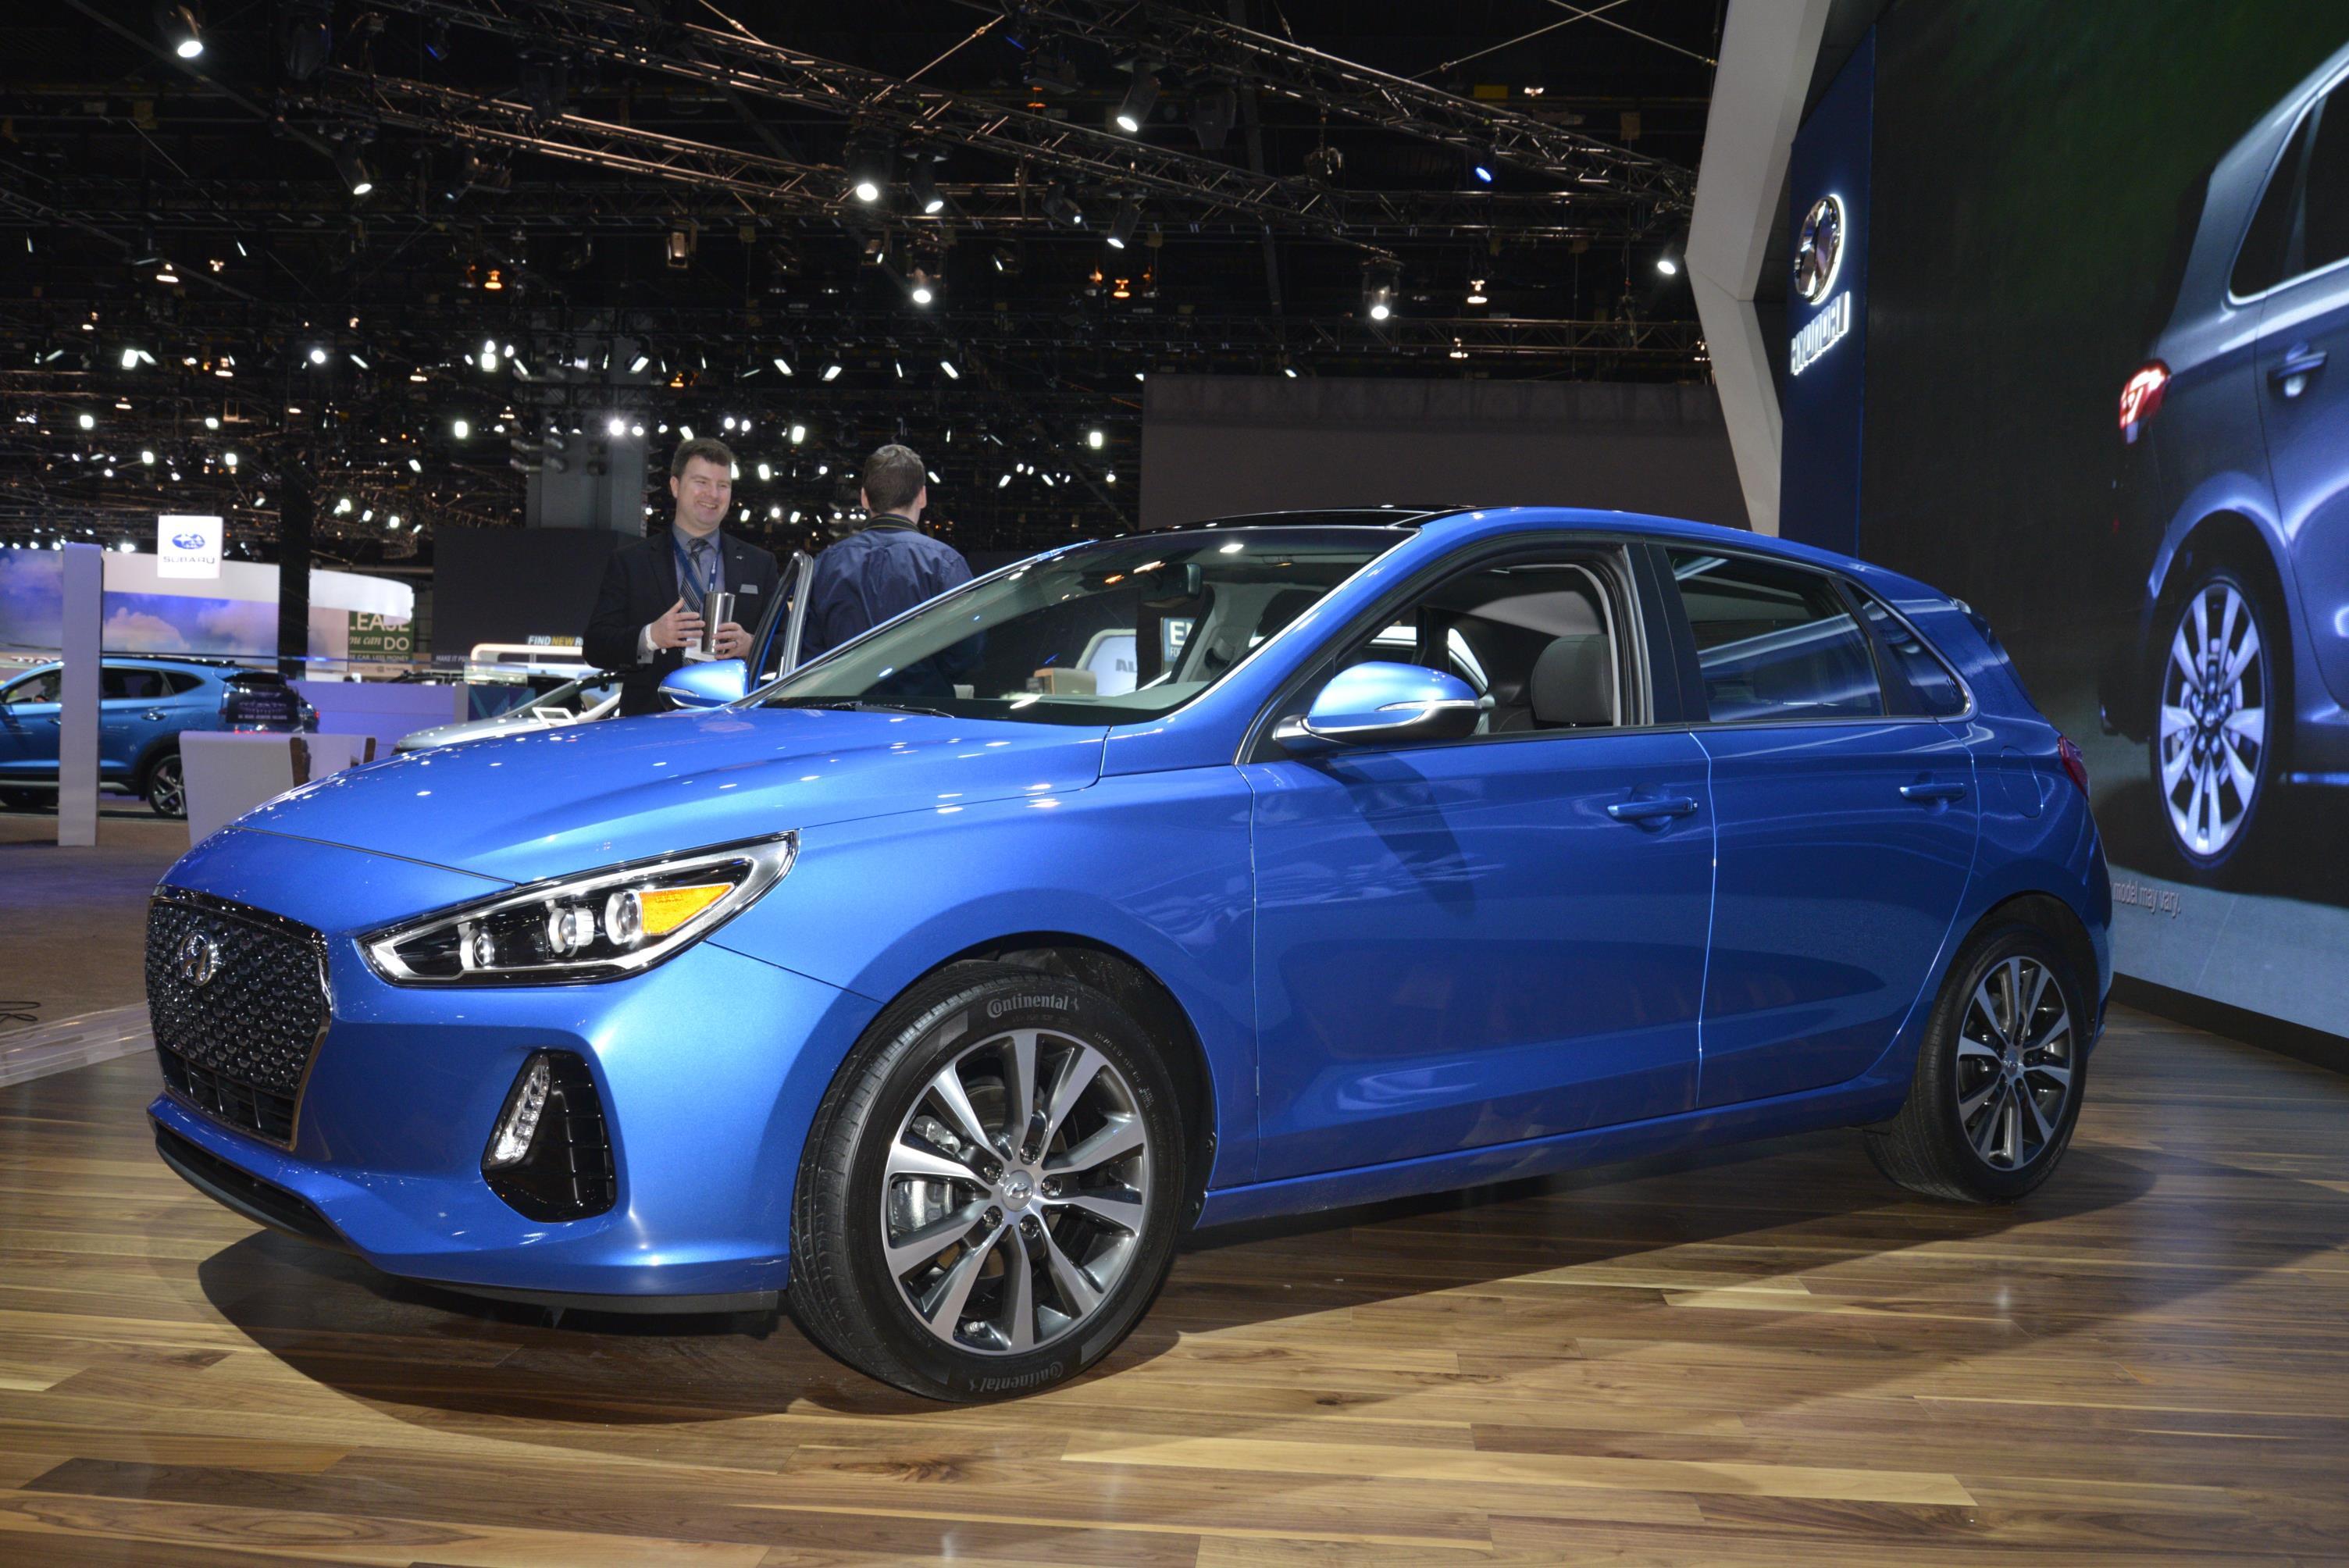 2018 Hyundai Elantra GT Is the Most Powerful Euro-Hatch - autoevolution